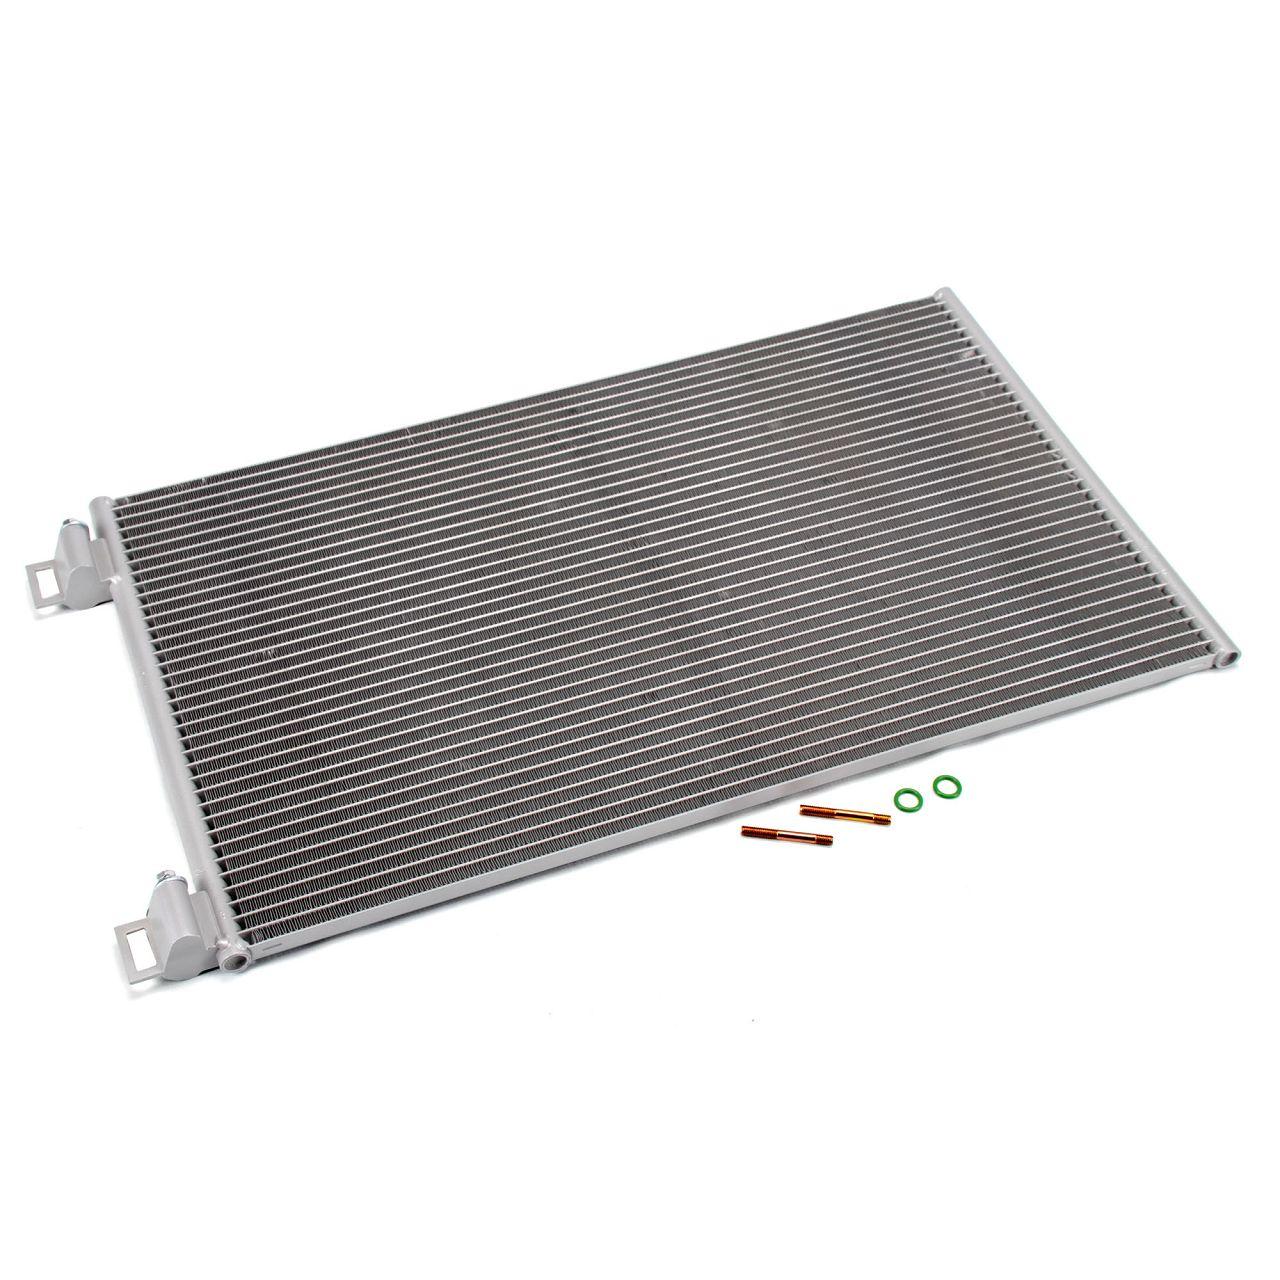 NRF 35902 Kondensator Klimakondensator EASY FIT MERCEDES-BENZ Citan 415 RENAULT Kangoo